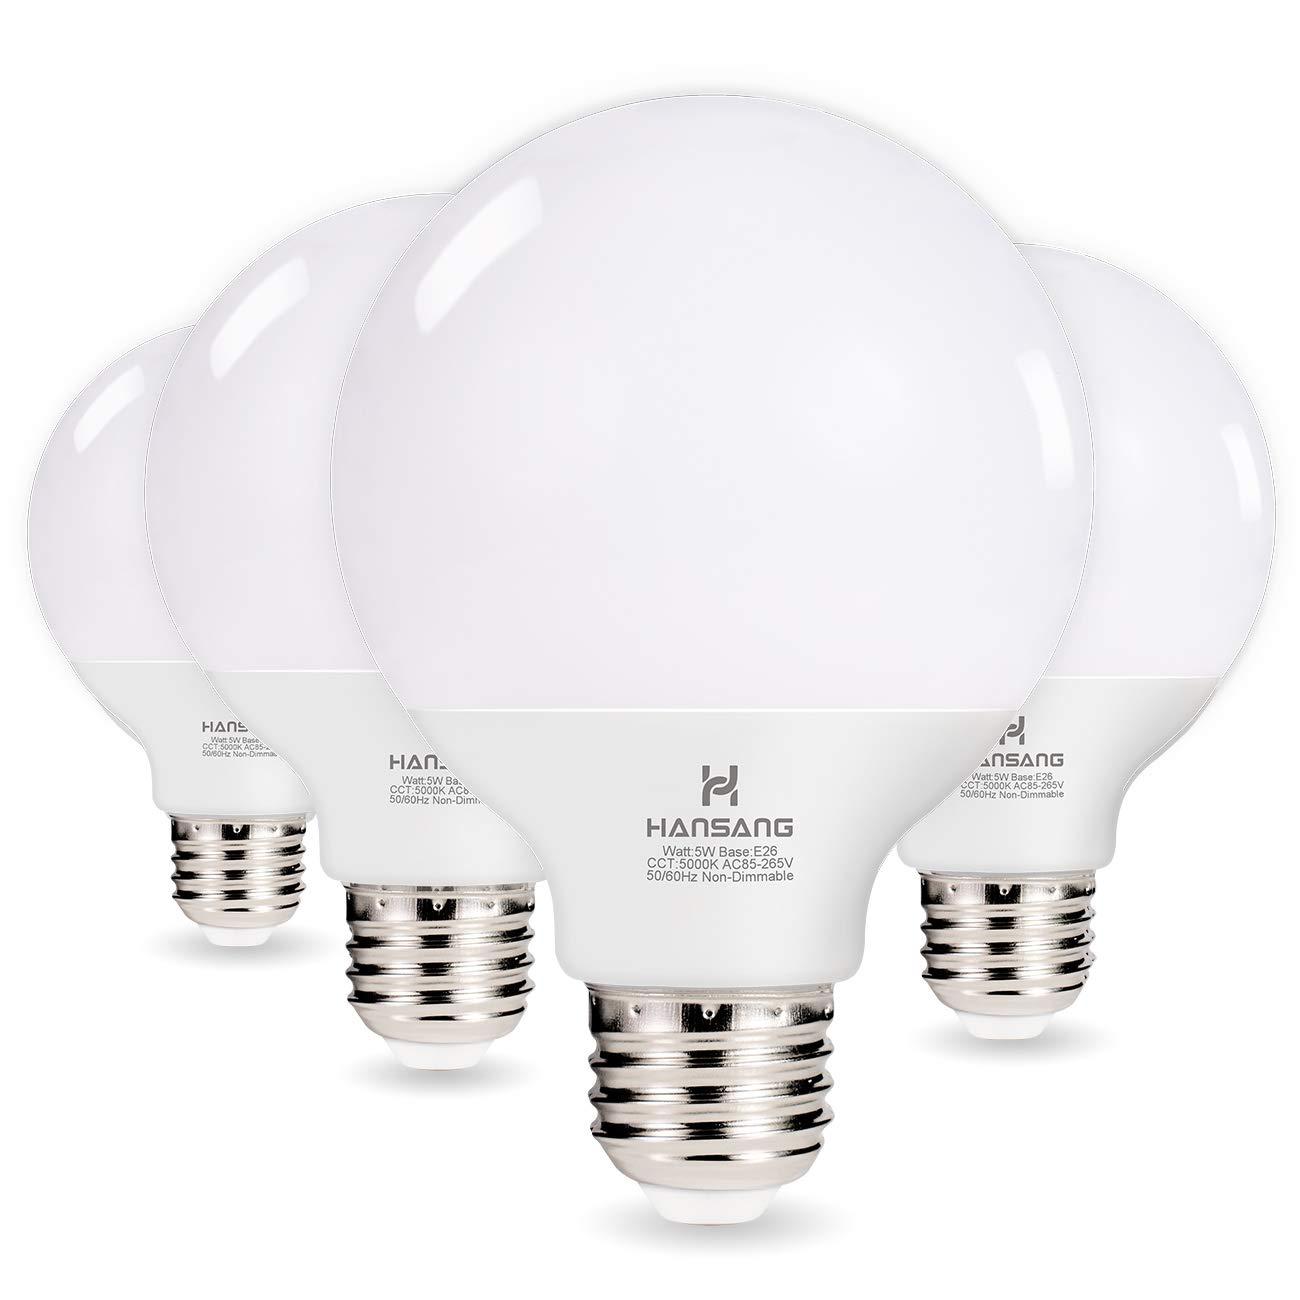 Hansang G25 LED Globe Light Bulbs,60W Equivalent 5000K Daylight White Eye-friendly Decorative Vanity Round Light Bulbs E26 Base,Perfect For Vanity Makeup Mirror,droplight,Floor lamp,Non-Dimmable 4Pack